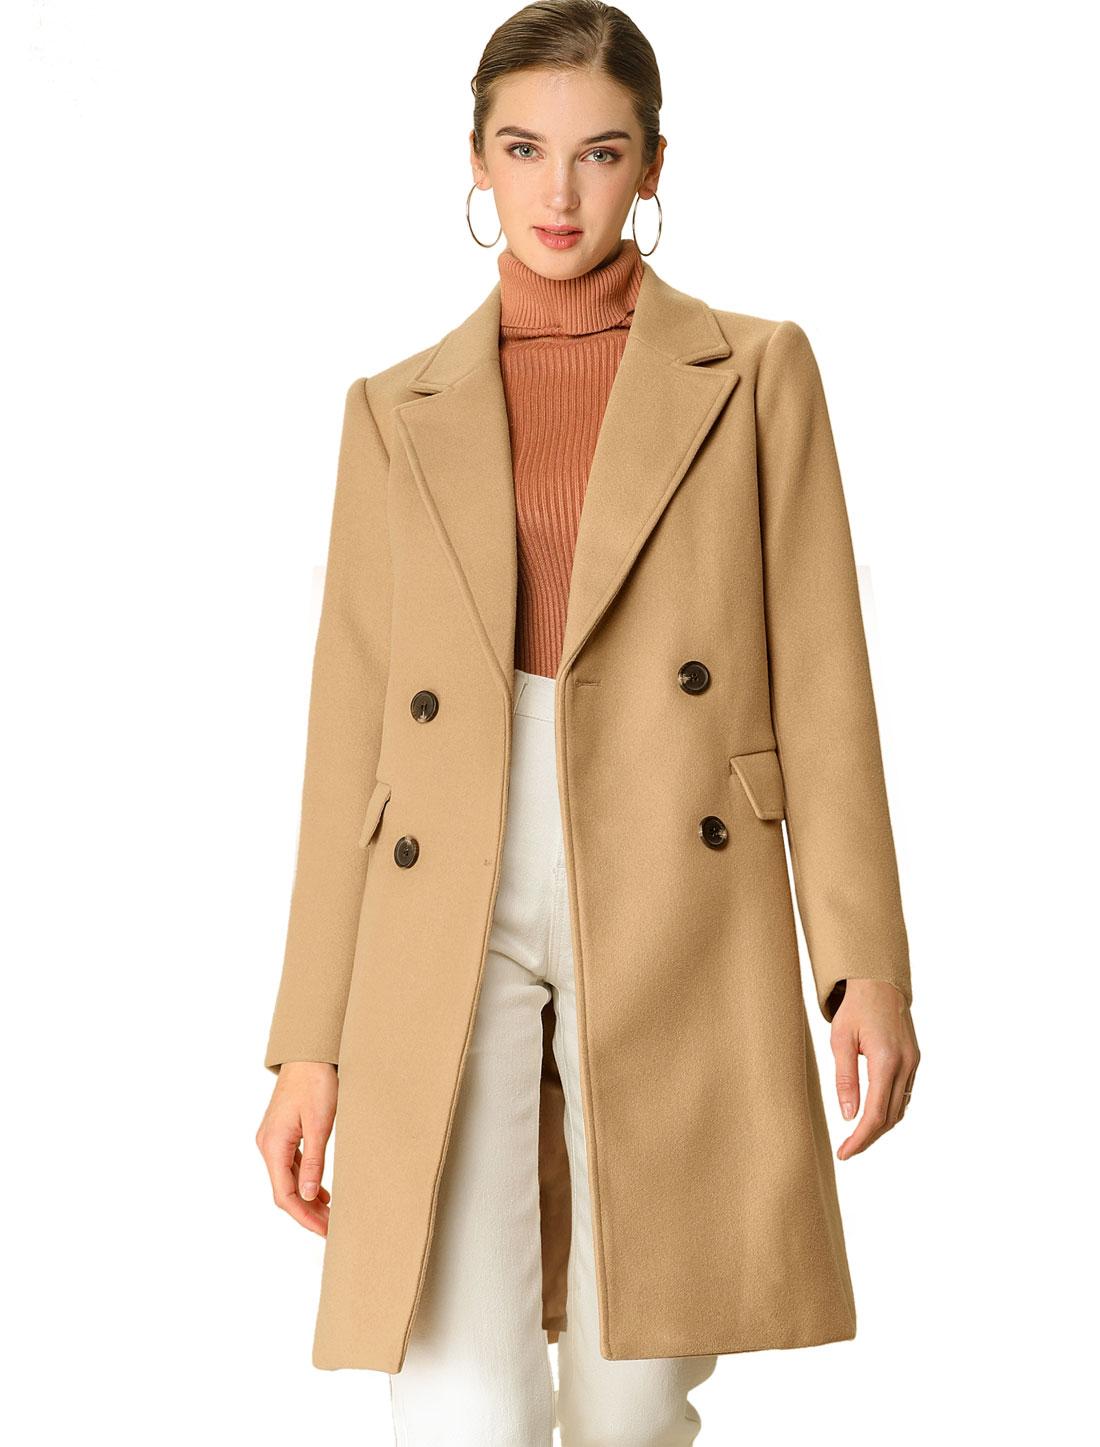 Allegra K Women's button Belt Long Jacket PeaTrench Coat Khaki L (US 14)